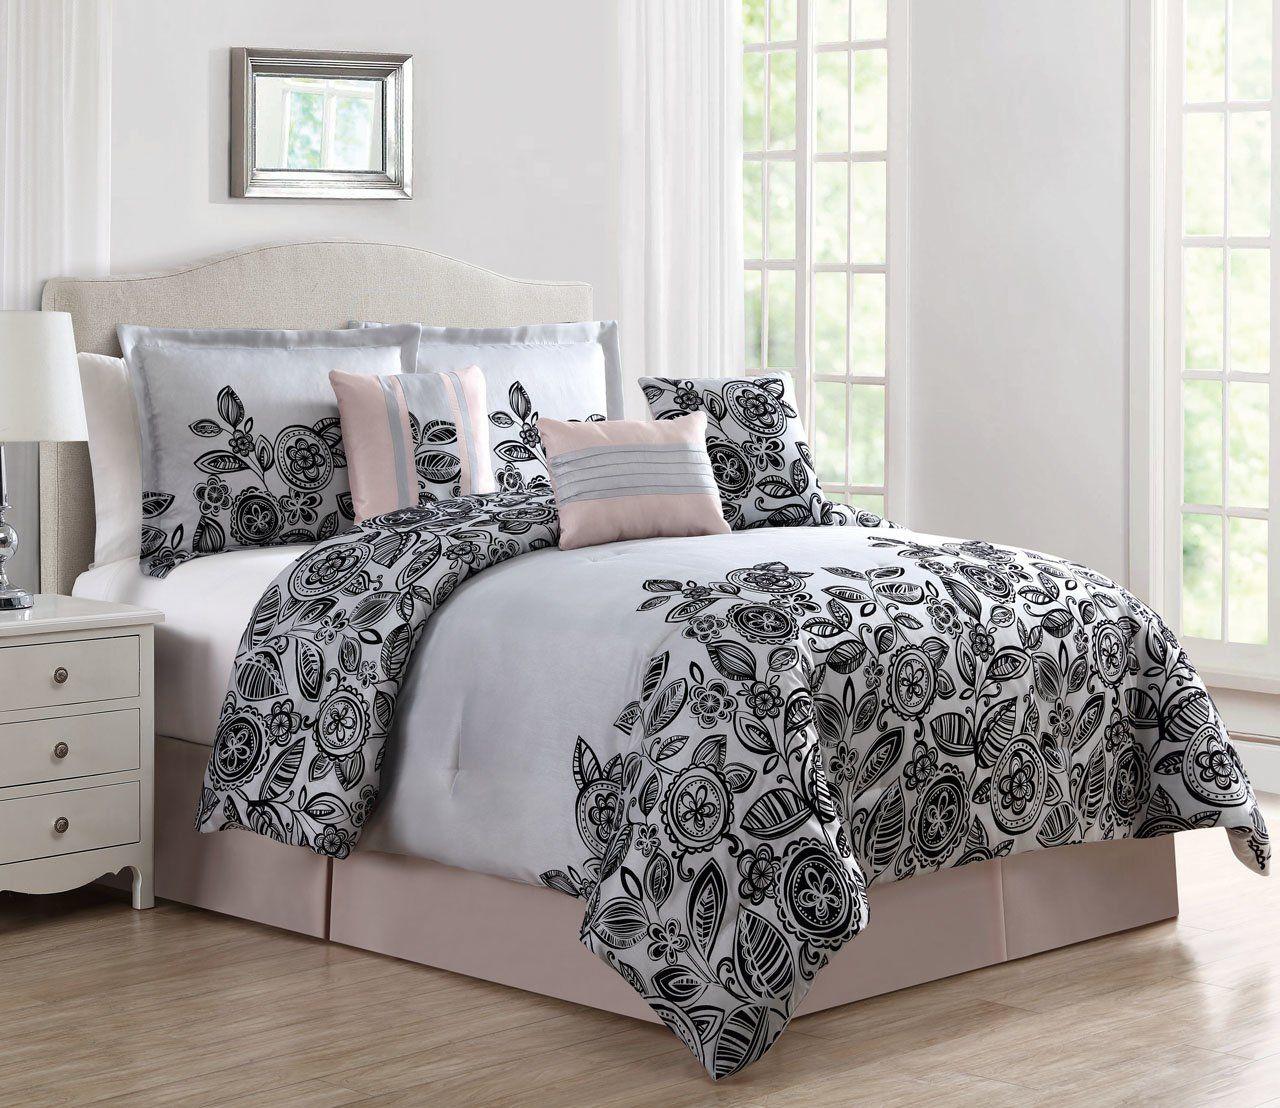 7 Piece Bertha Blush Gray Black Comforter Set Black Comforter Bed Comforters Black Comforter Sets